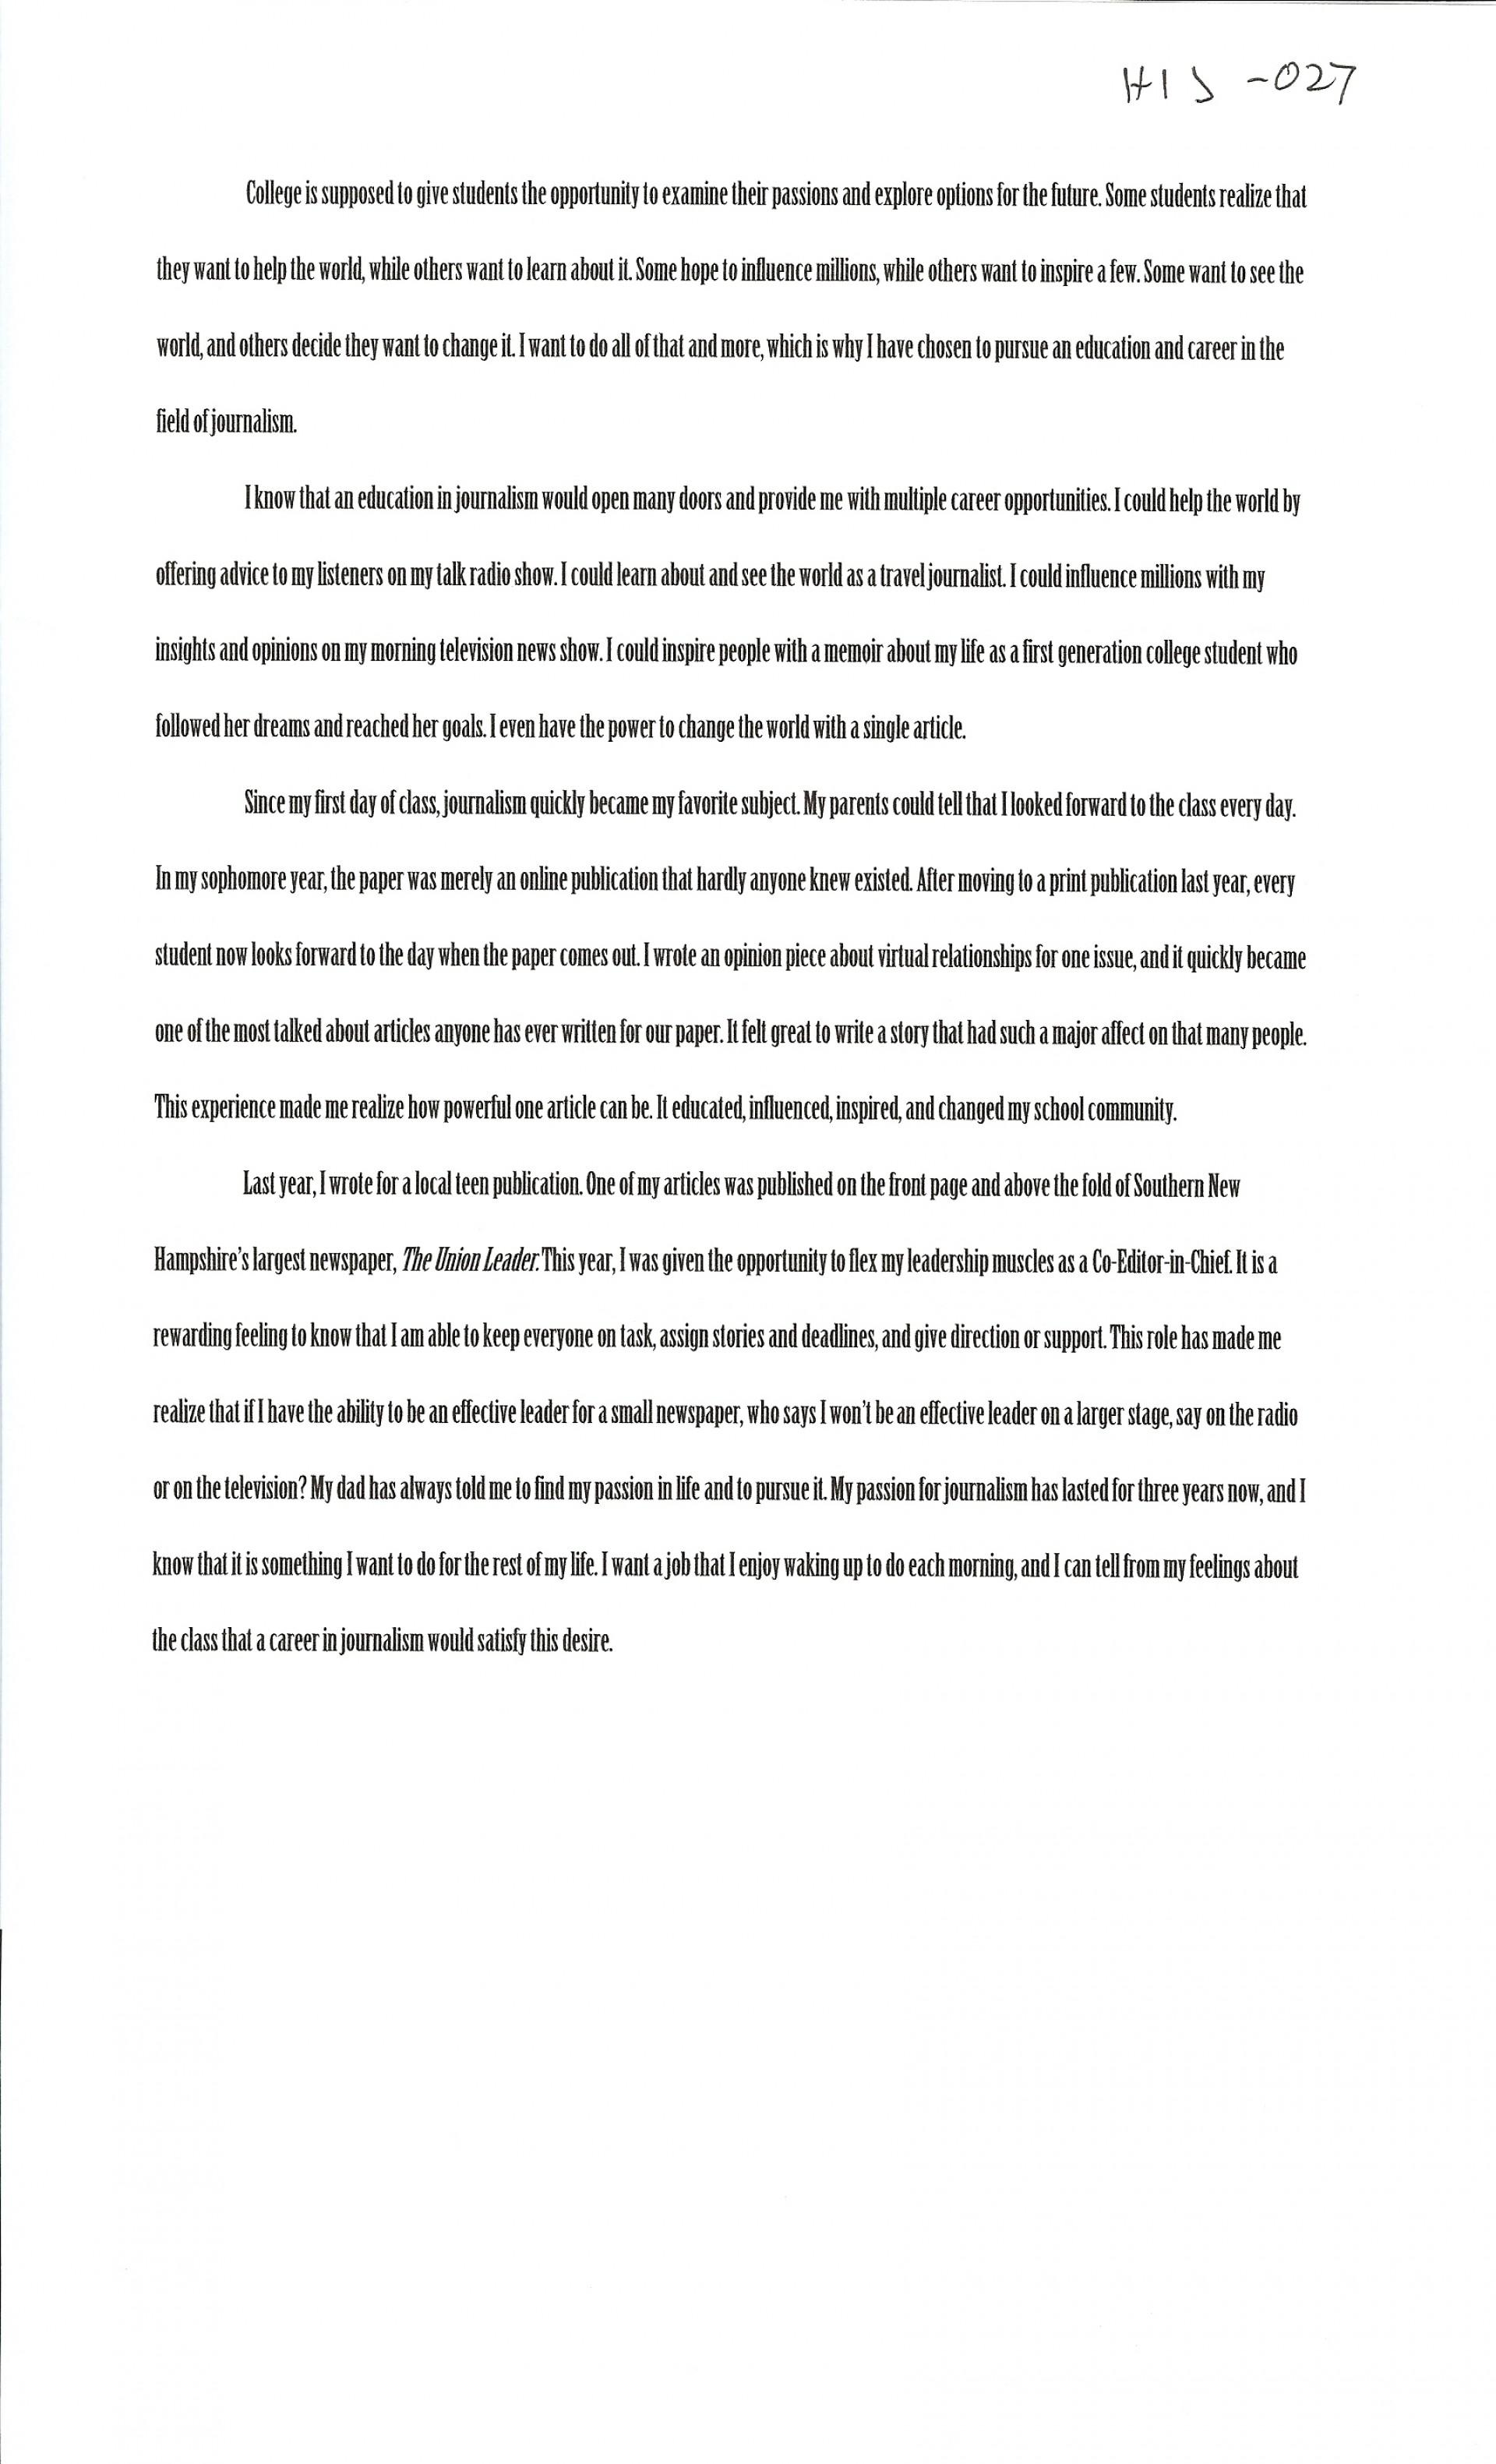 010 Alexa Serrecchia Essay Example Profile Examples On Surprising A Place 1920